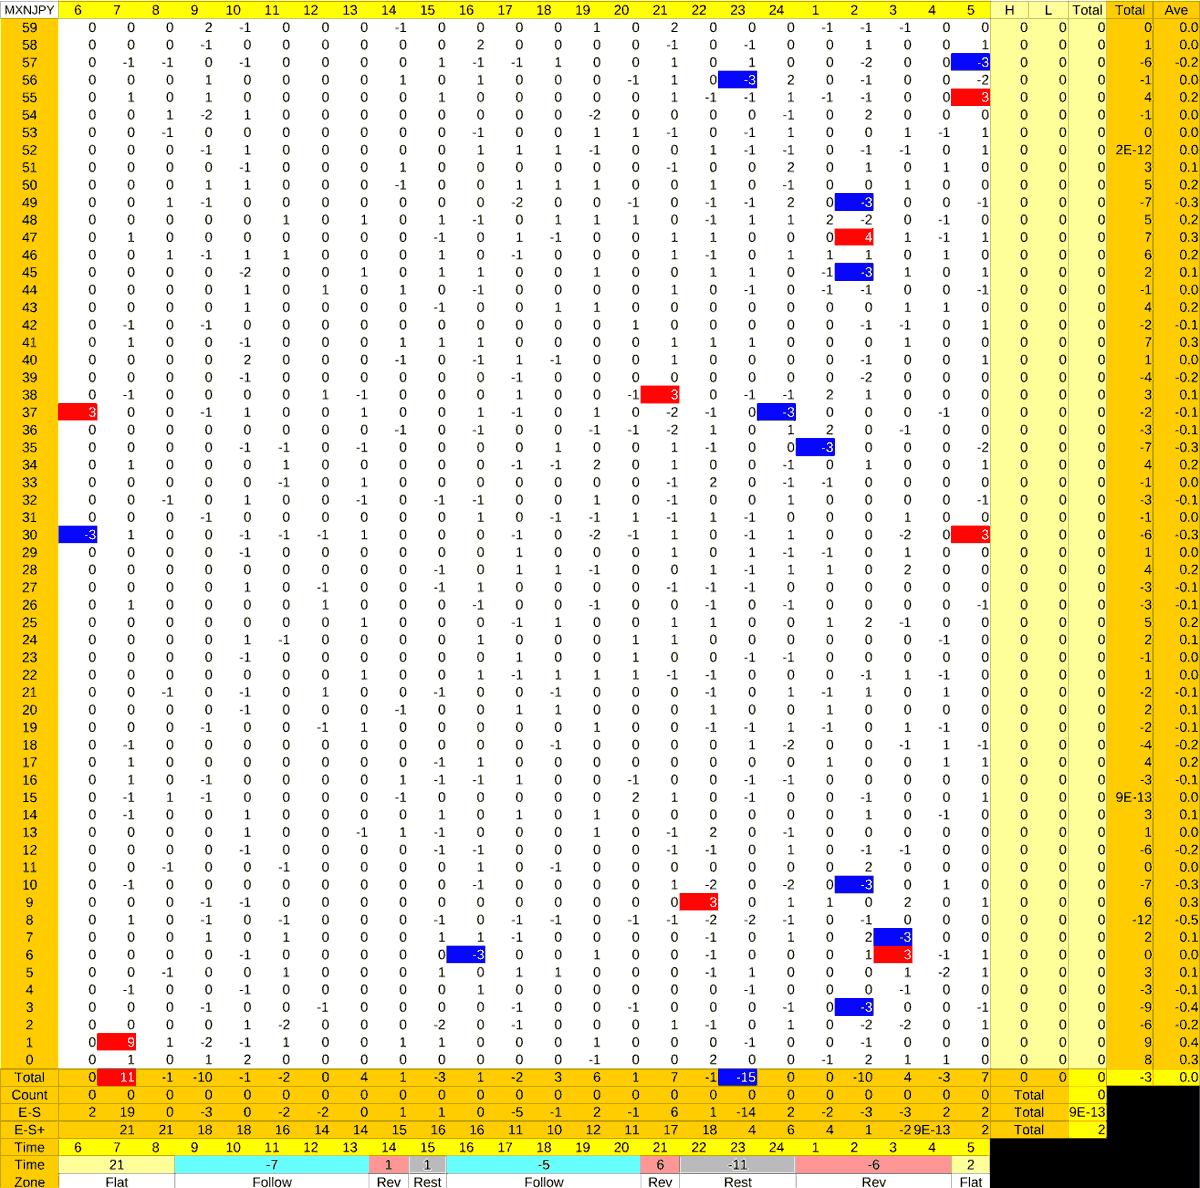 20210531_HS(3)MXNJPY